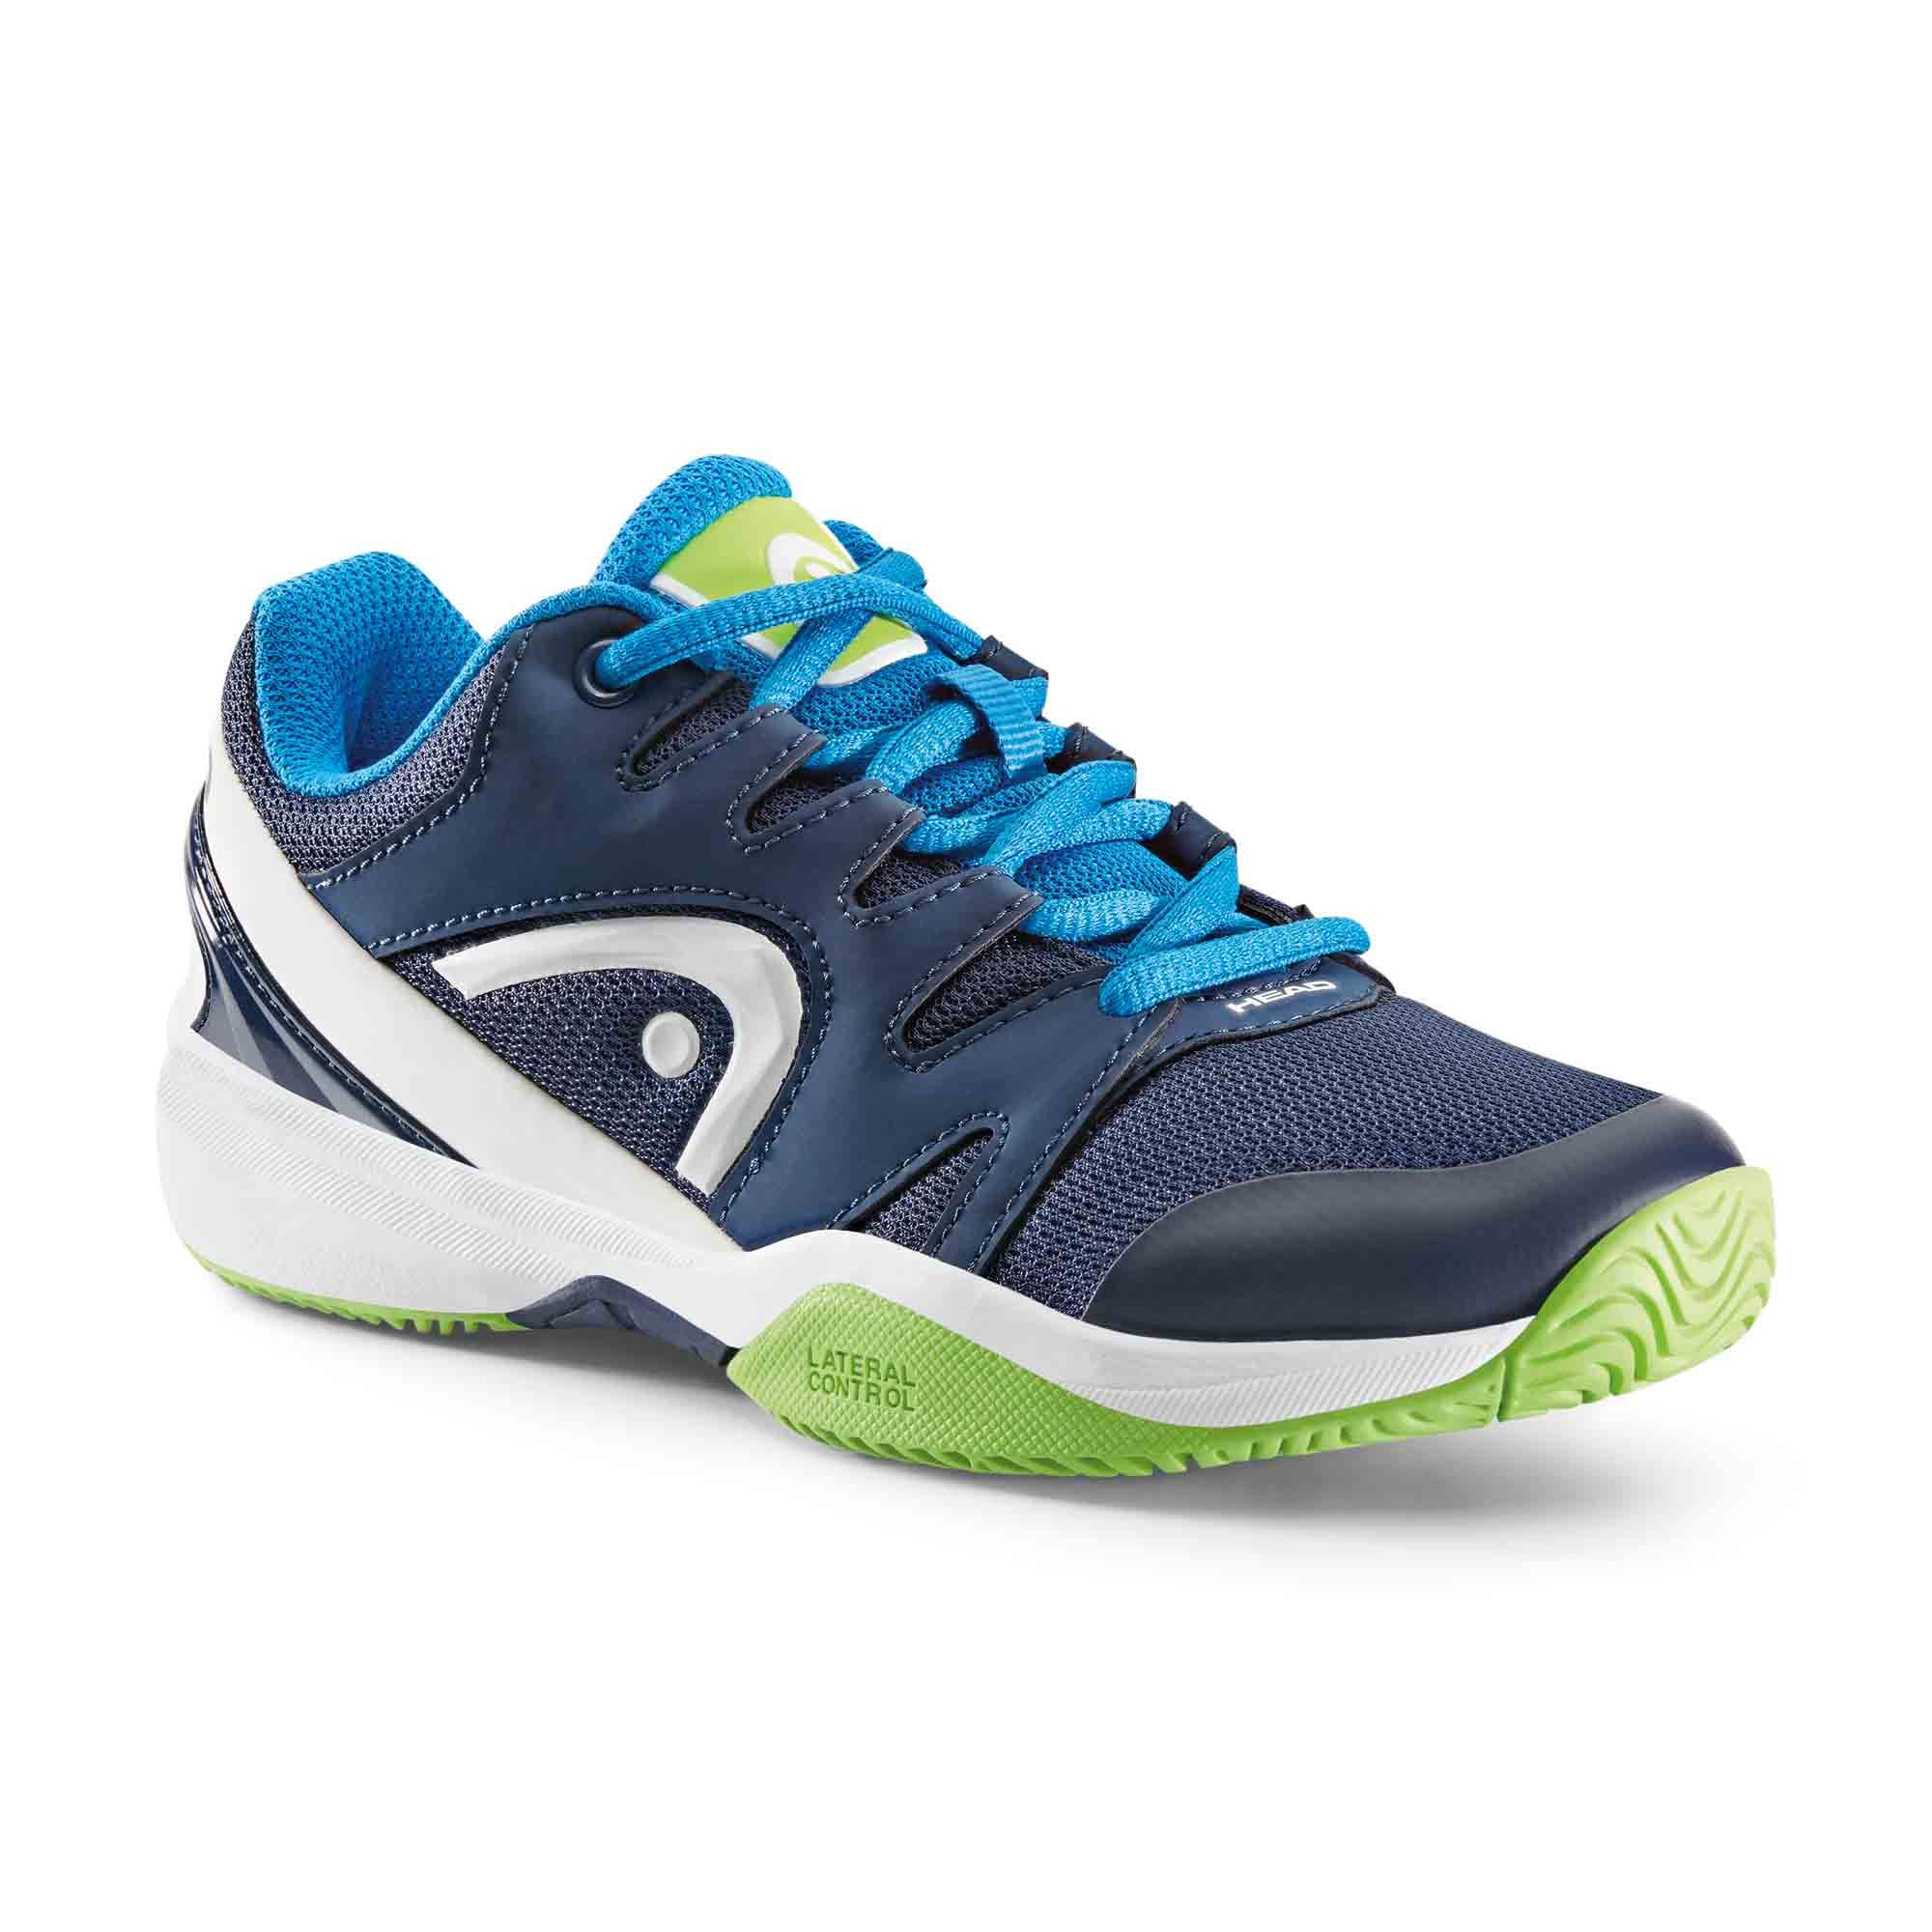 nitro junior tennis shoes sweatband